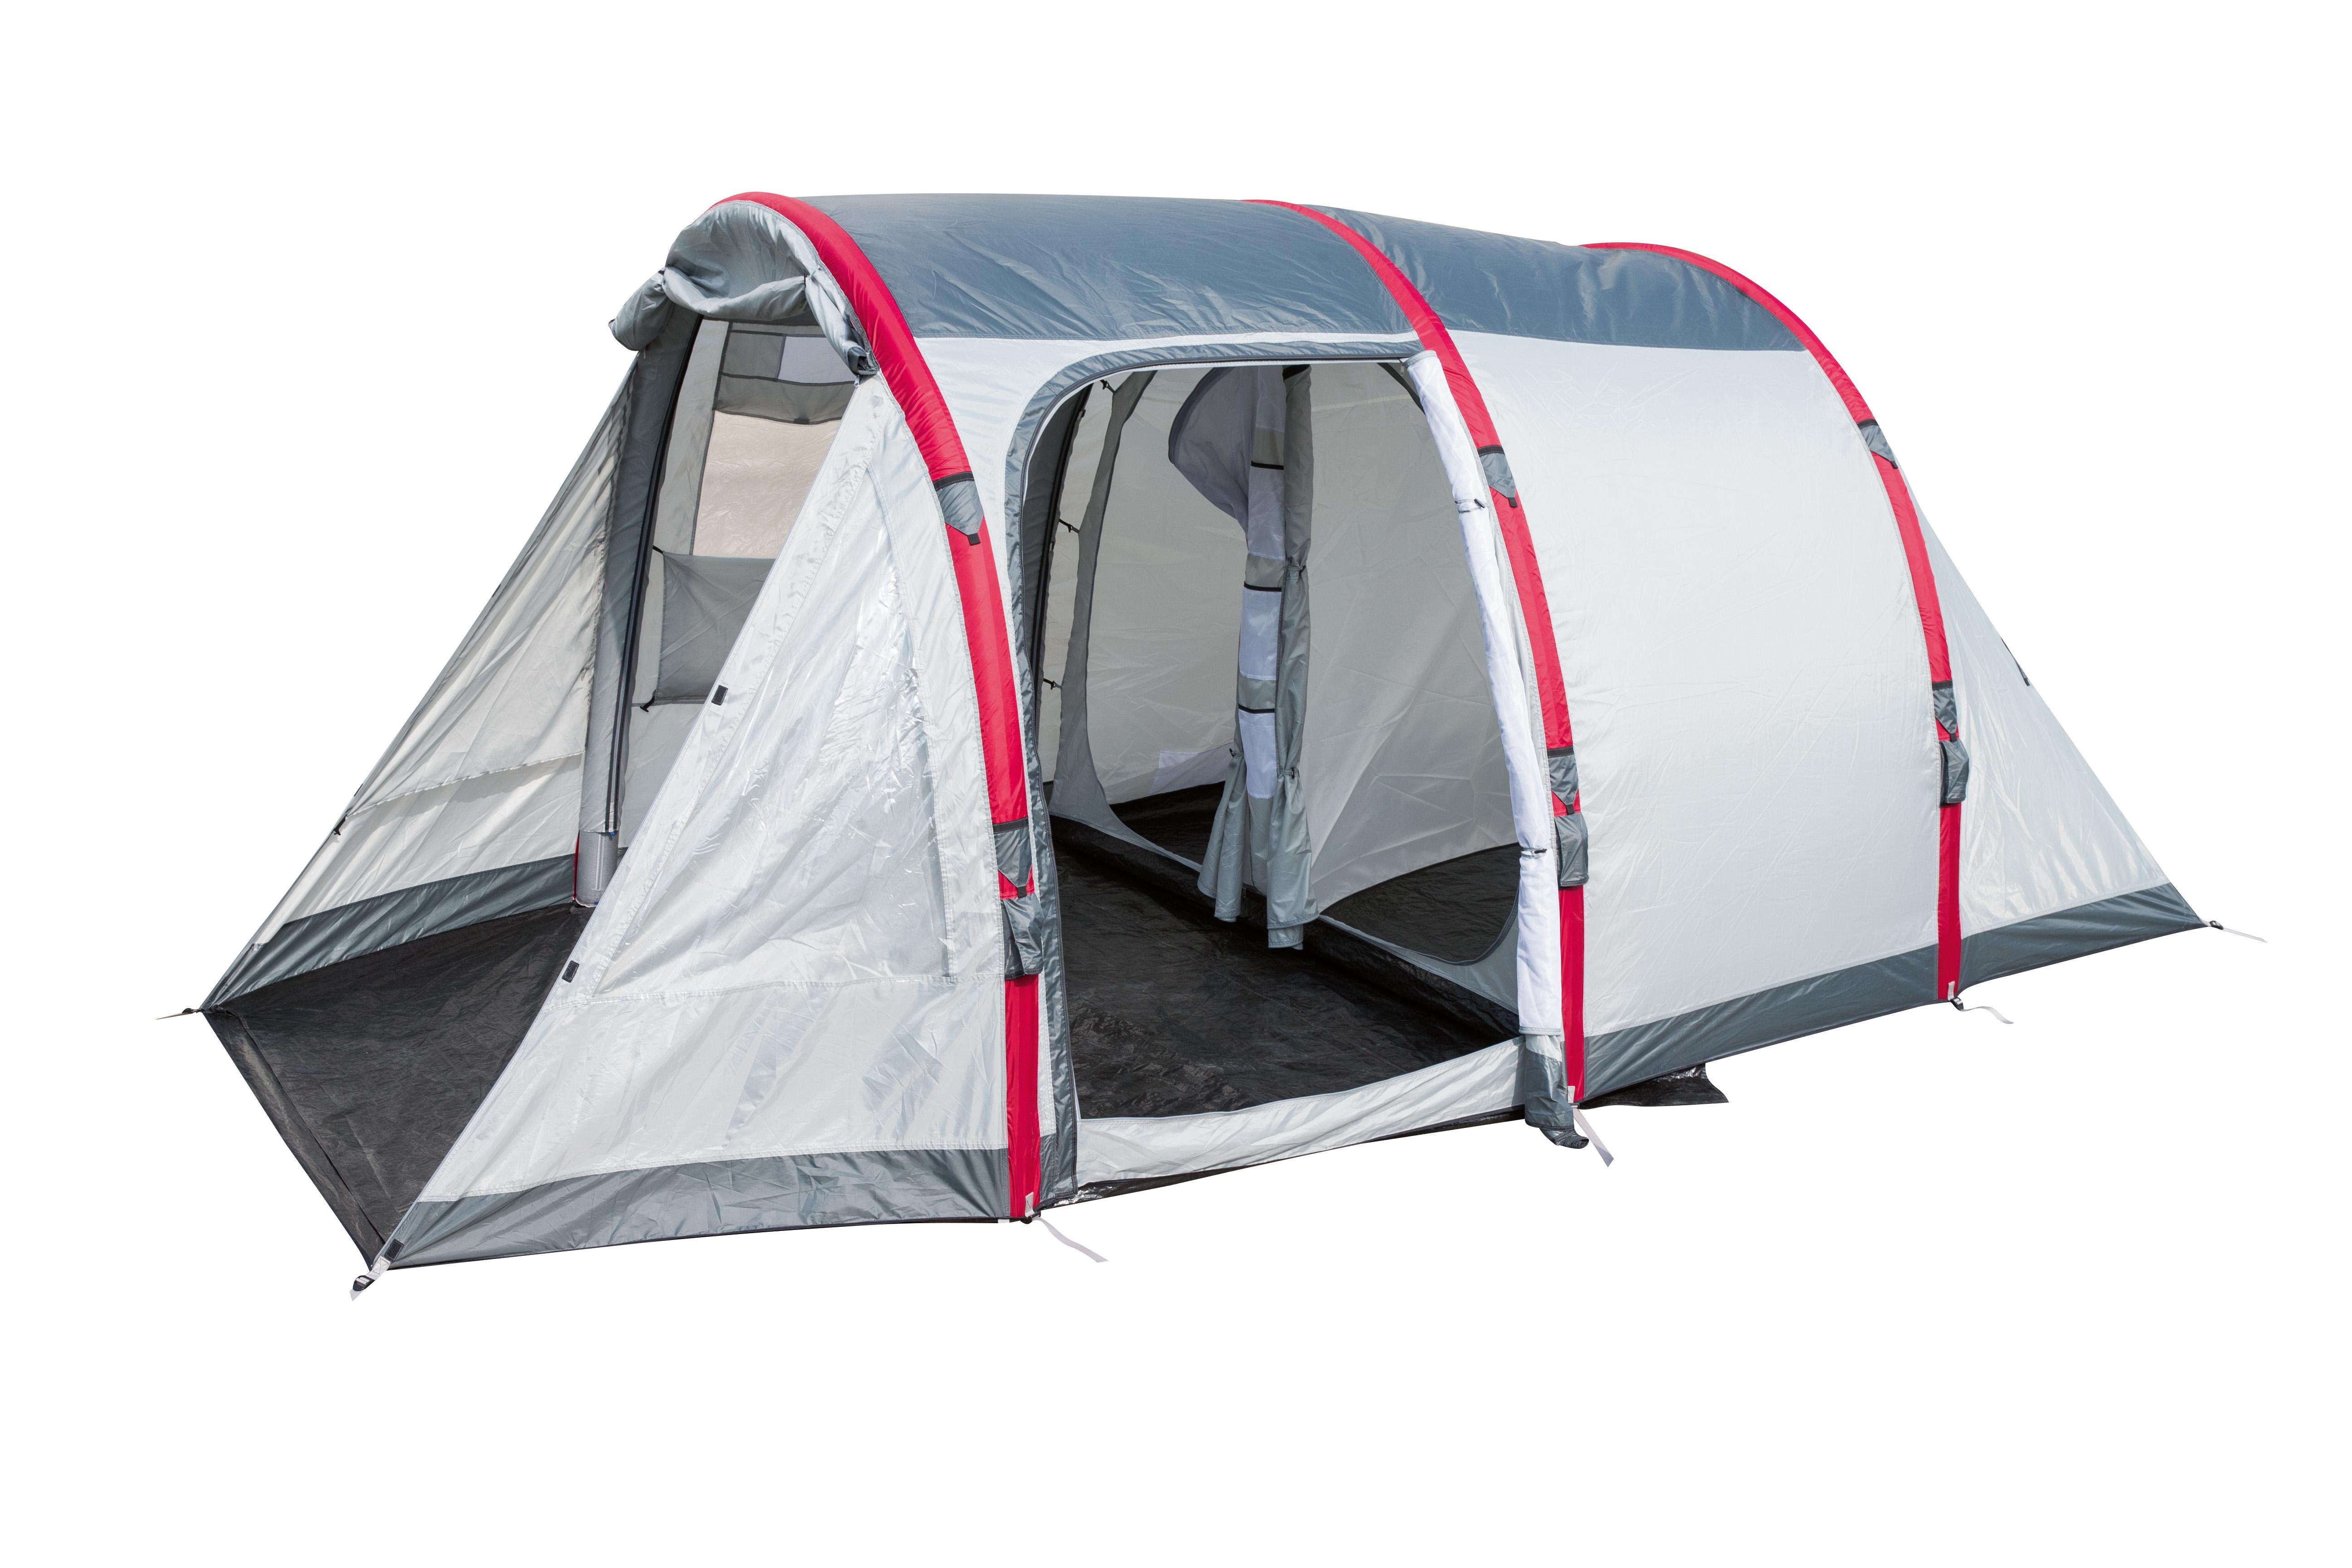 Bestway Sierra Ridge Air X4 Tent - 4 personen